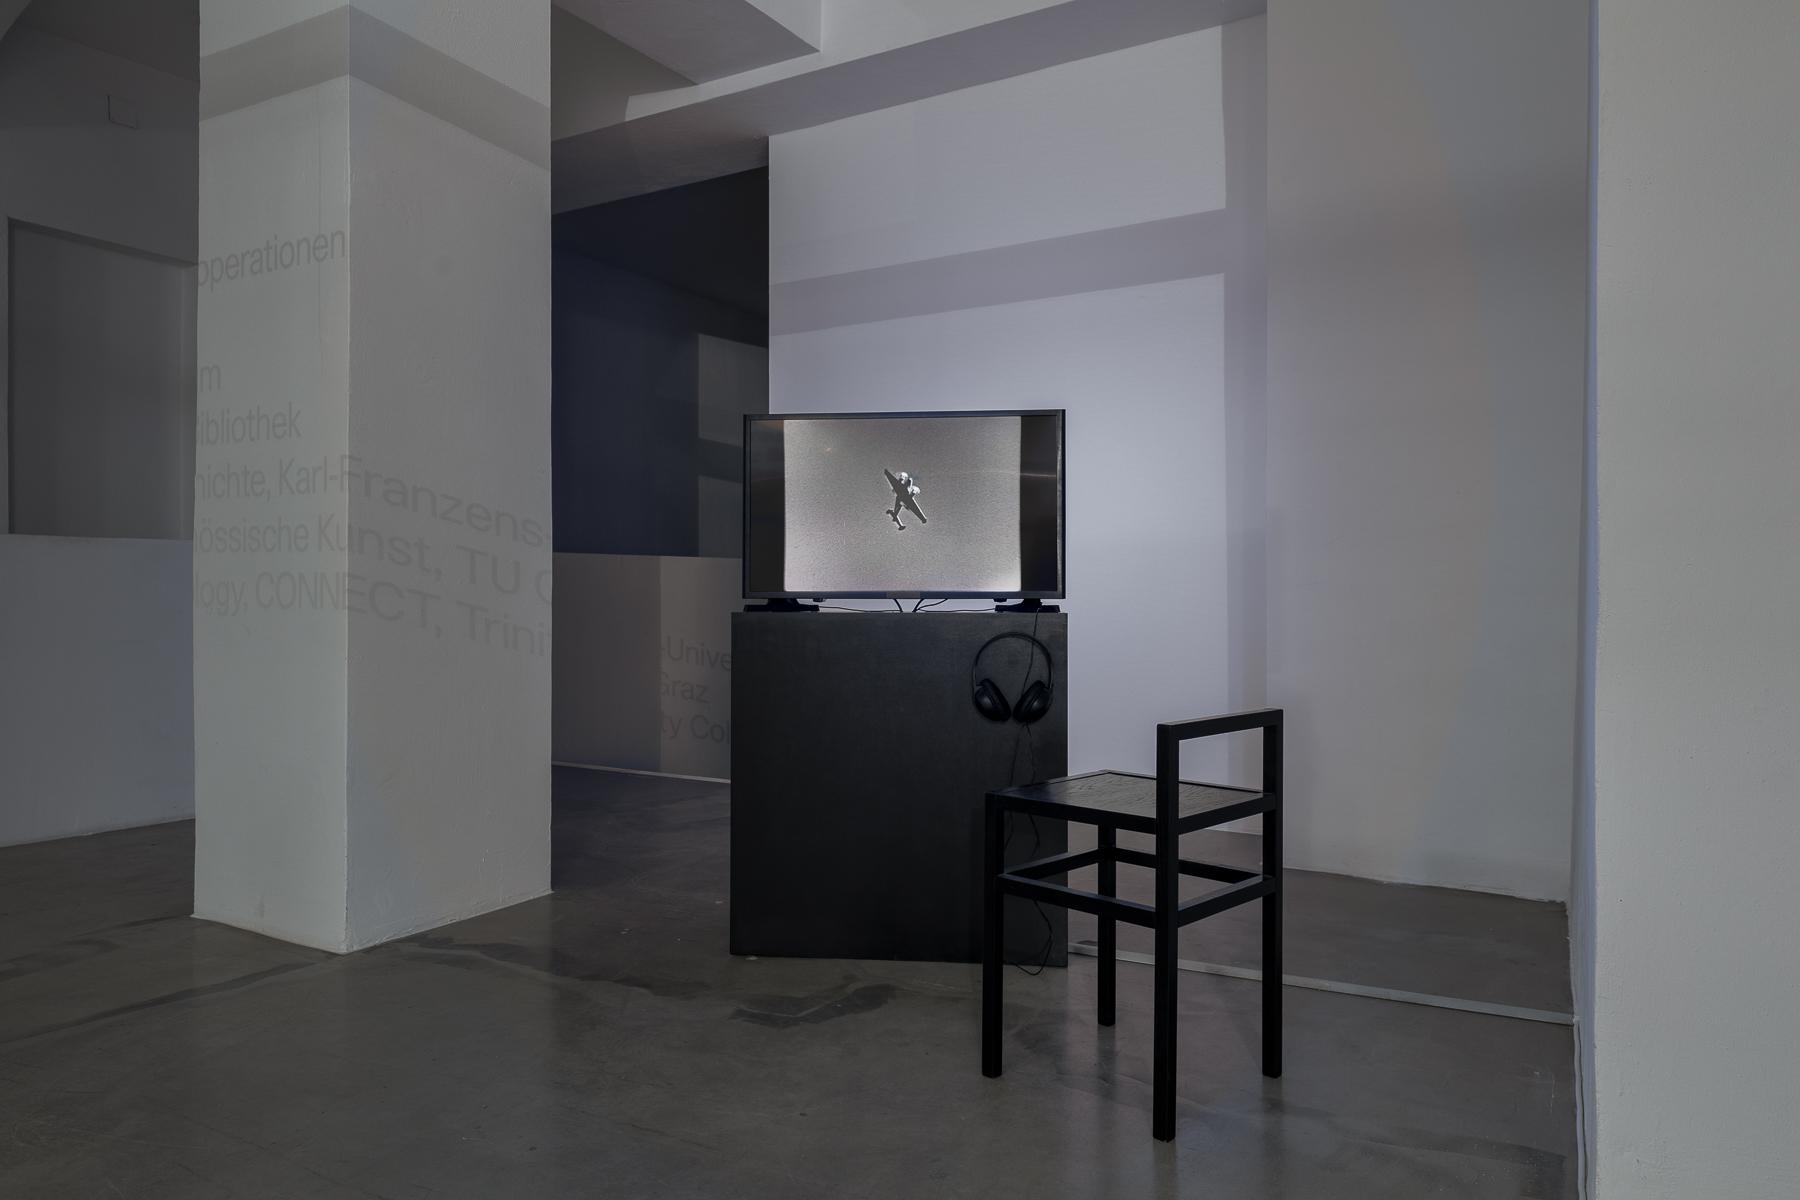 2019_03_11_Grazer Kunstverein_063_web.jpg